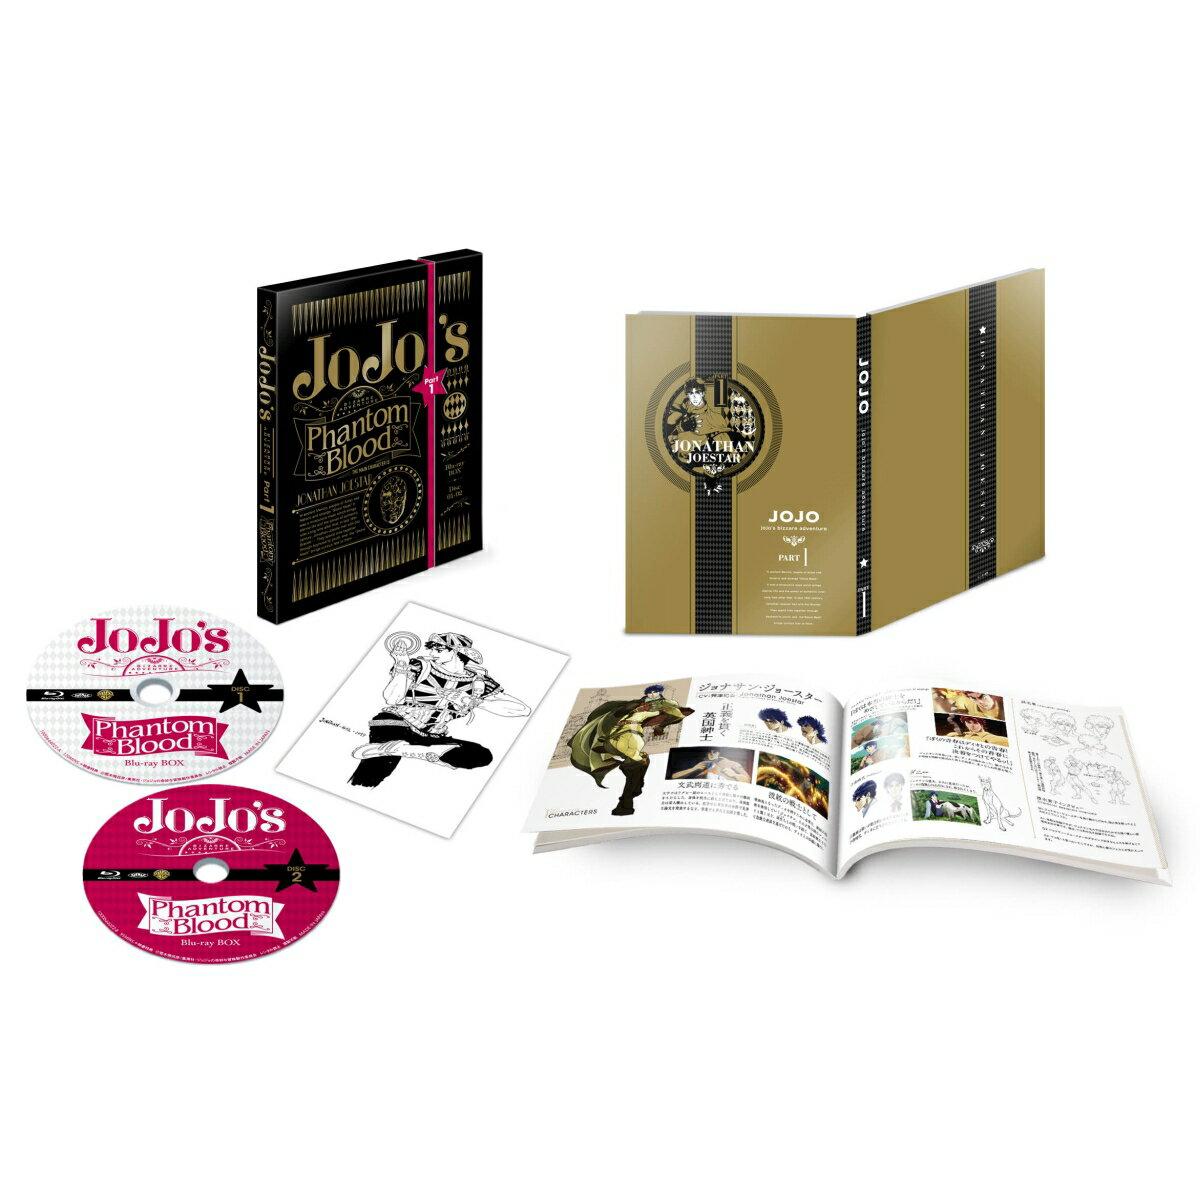 TVアニメ ジョジョの奇妙な冒険 第1部 ファントムブラッド Blu-ray BOX(初回仕様版)【Blu-ray】画像